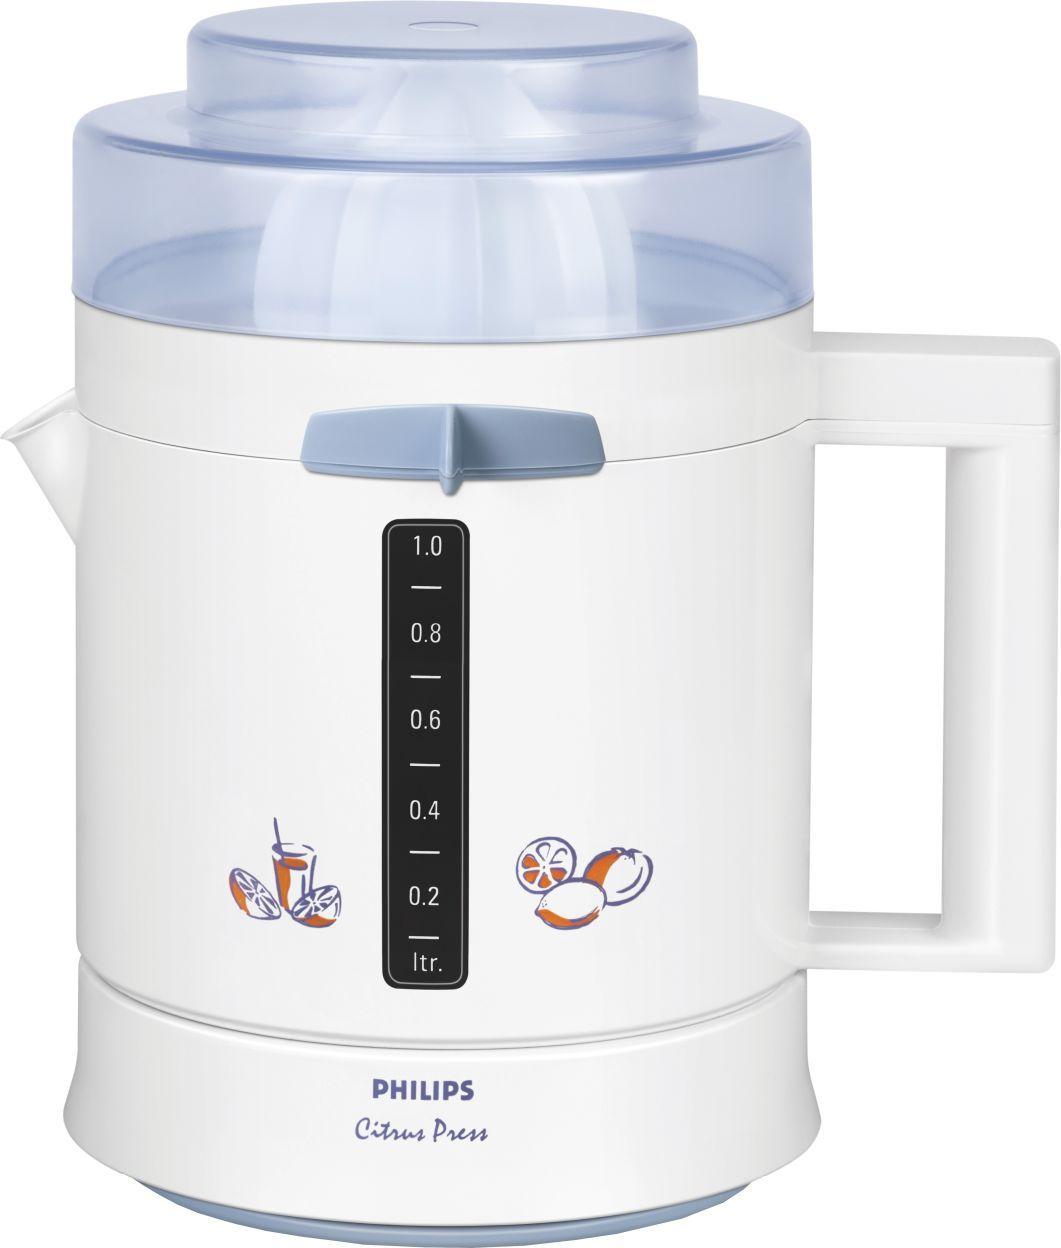 Kitchen Appliances Signora Power Juicer Philips Citrus Press Hr2775 25w Juice Extractor